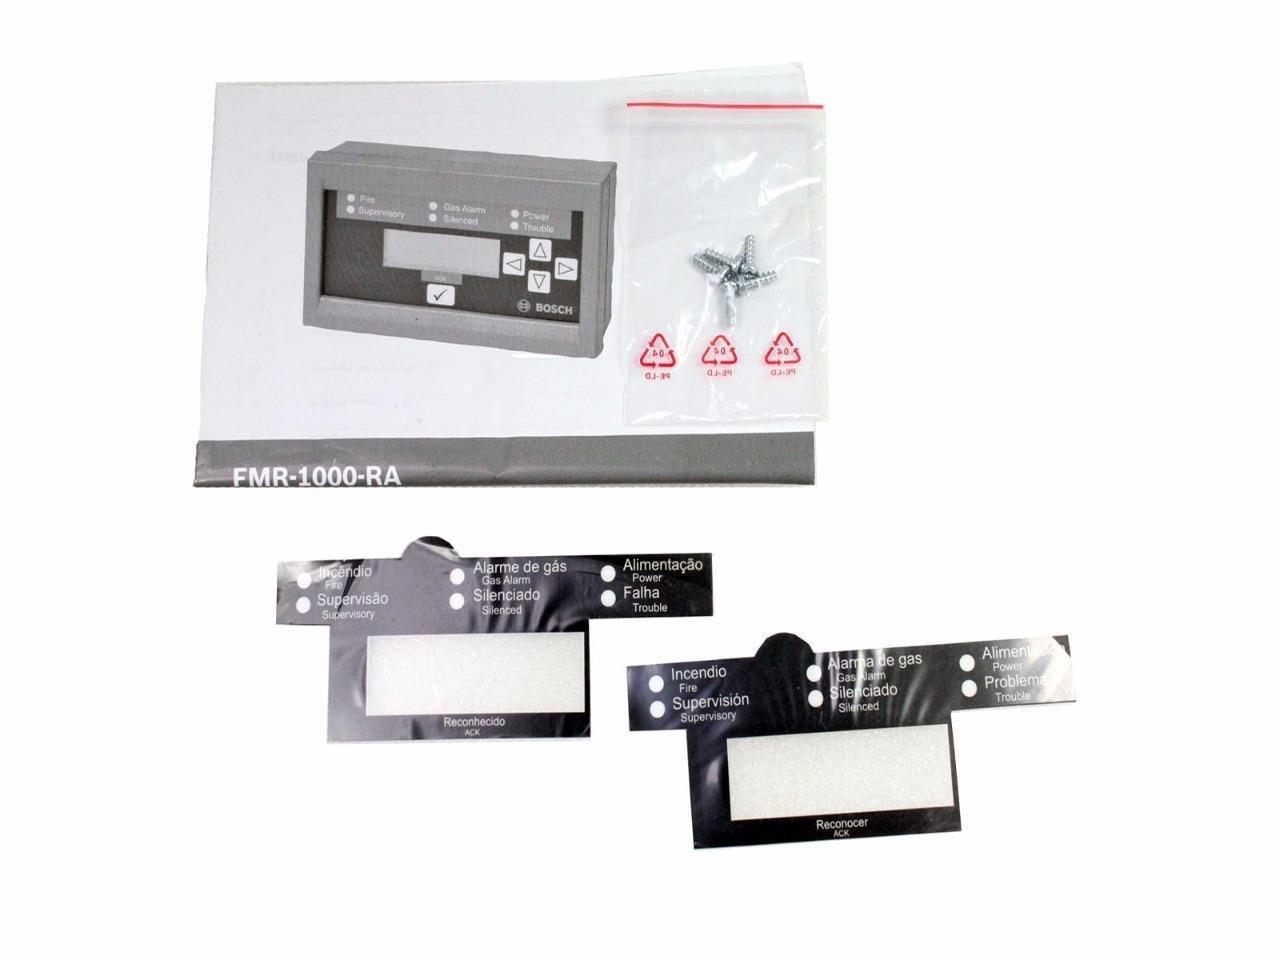 Amazon.com: Bosch FMR-1000-RA Red Remote Annunciator 80 ...